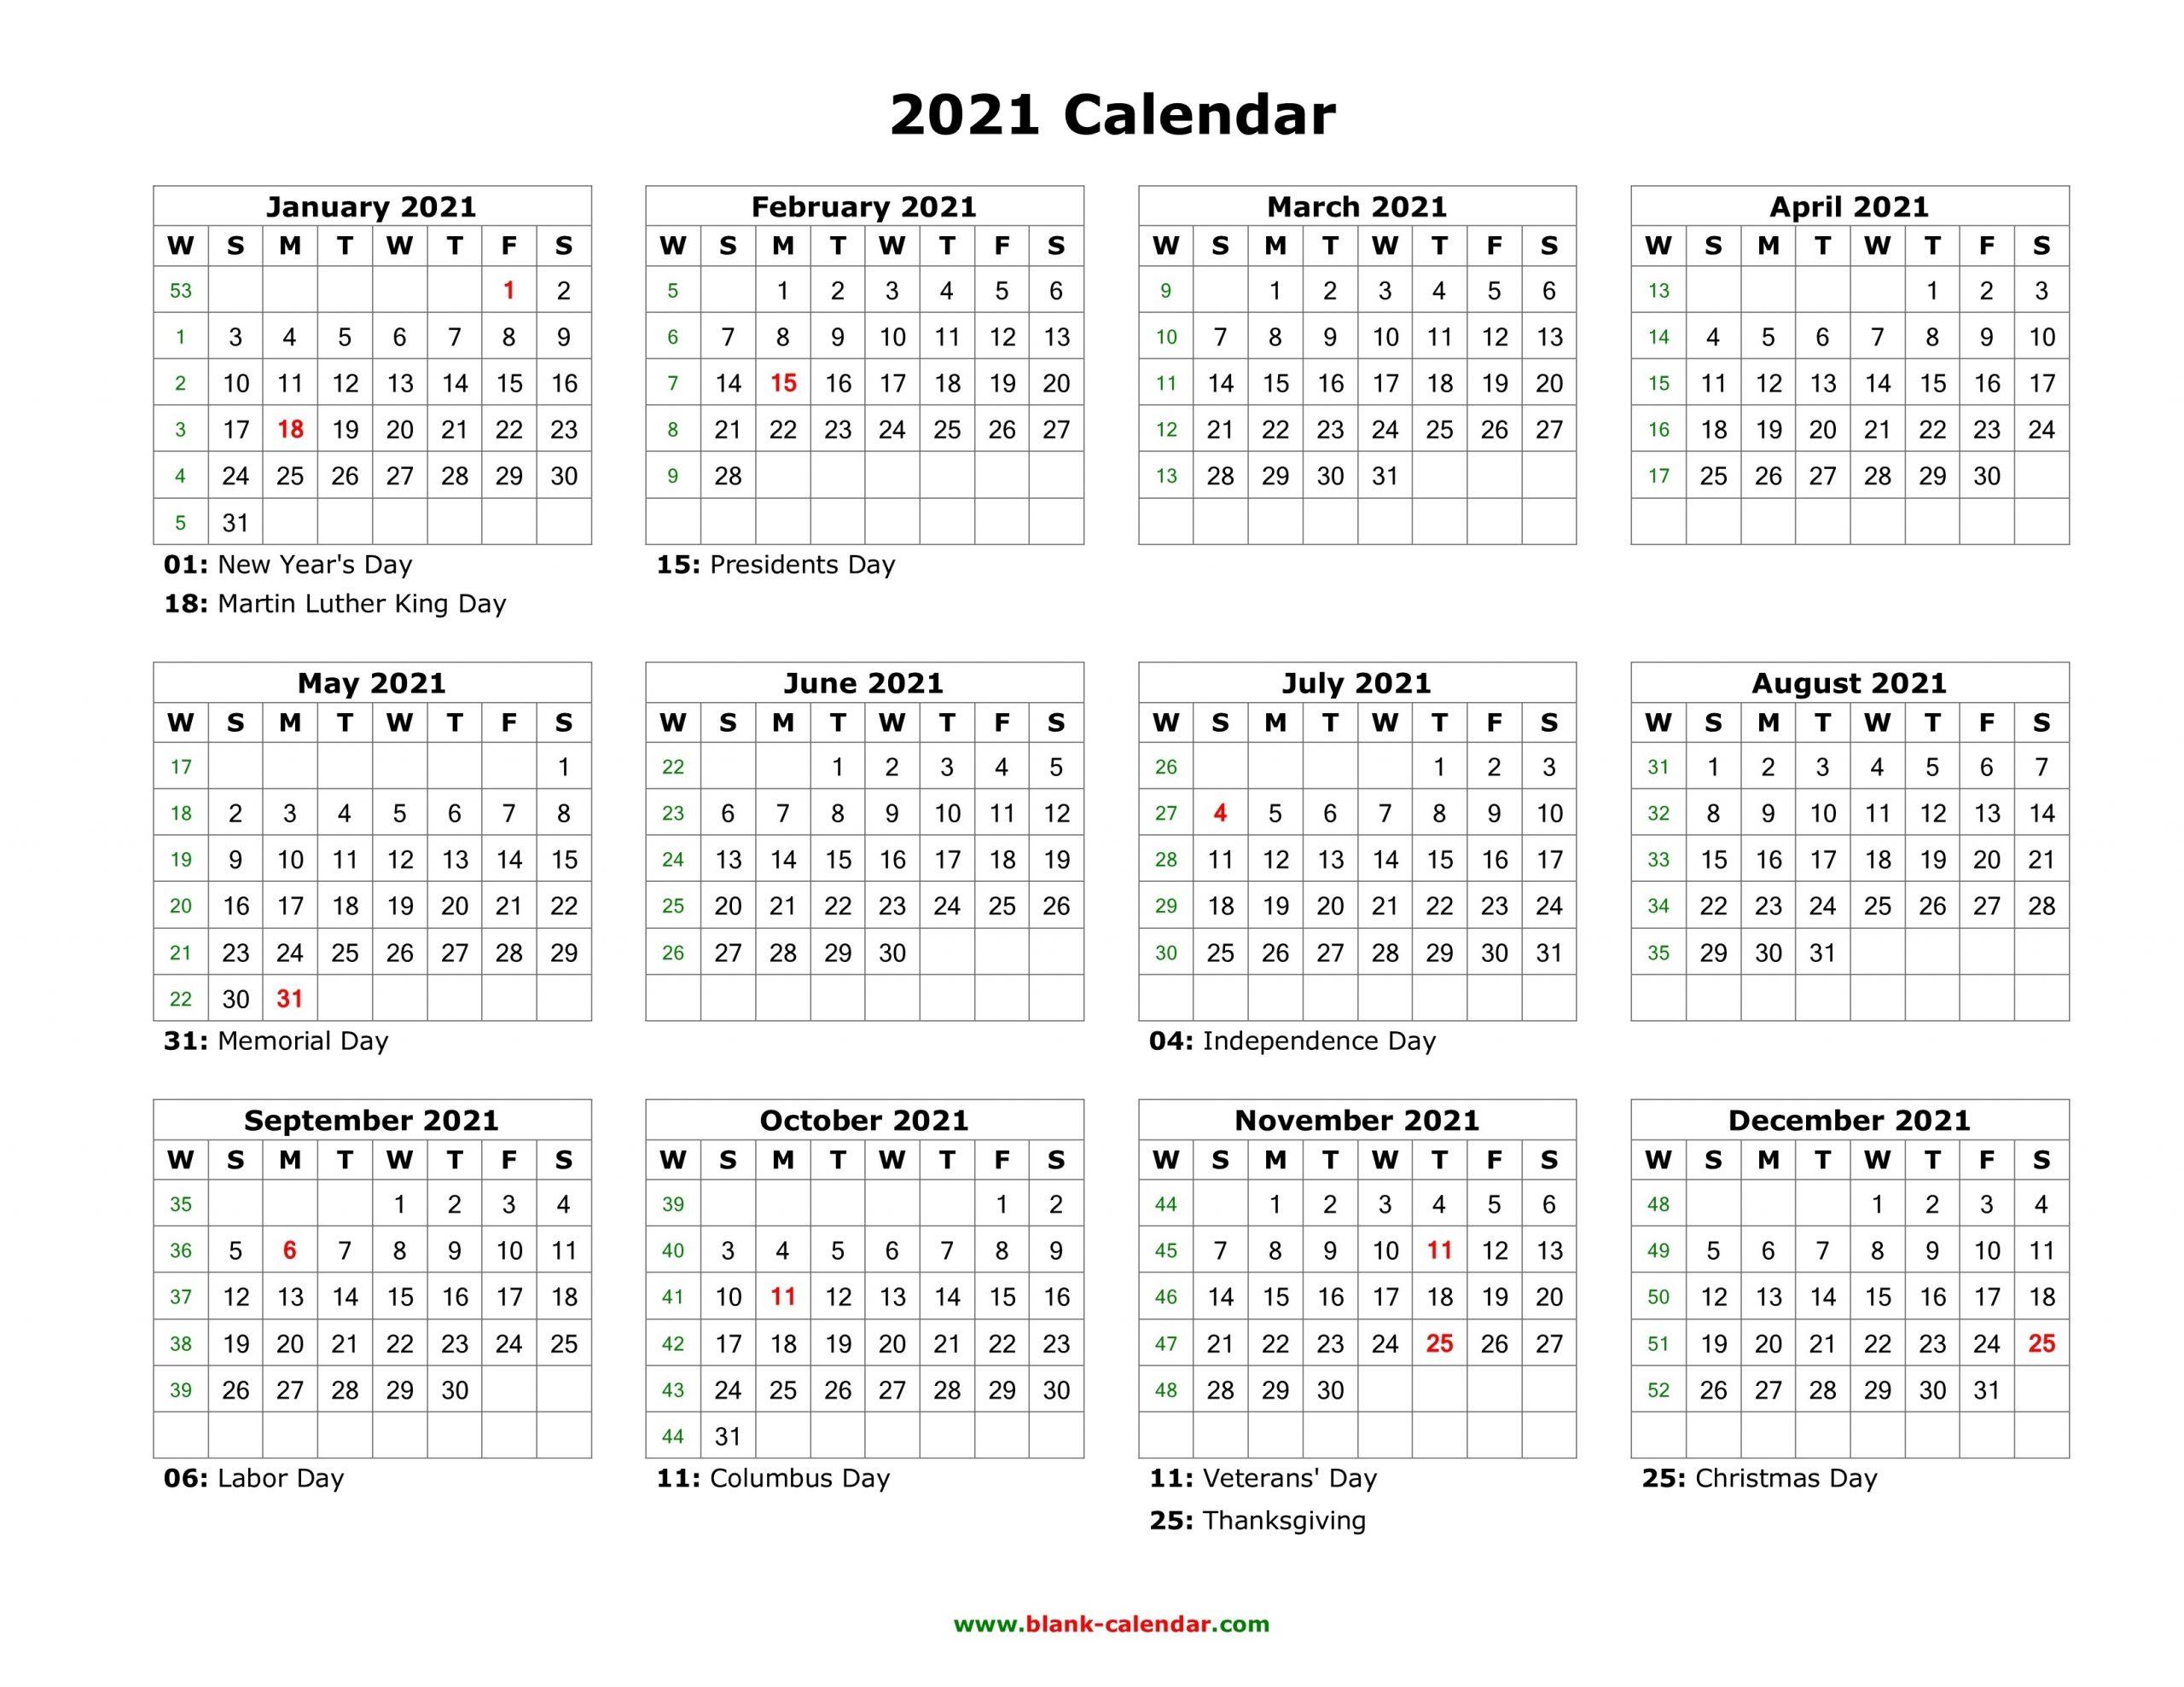 Blank Calendar 2021 | Free Download Calendar Templates-Microsoft 2021 Calendar Templates Free